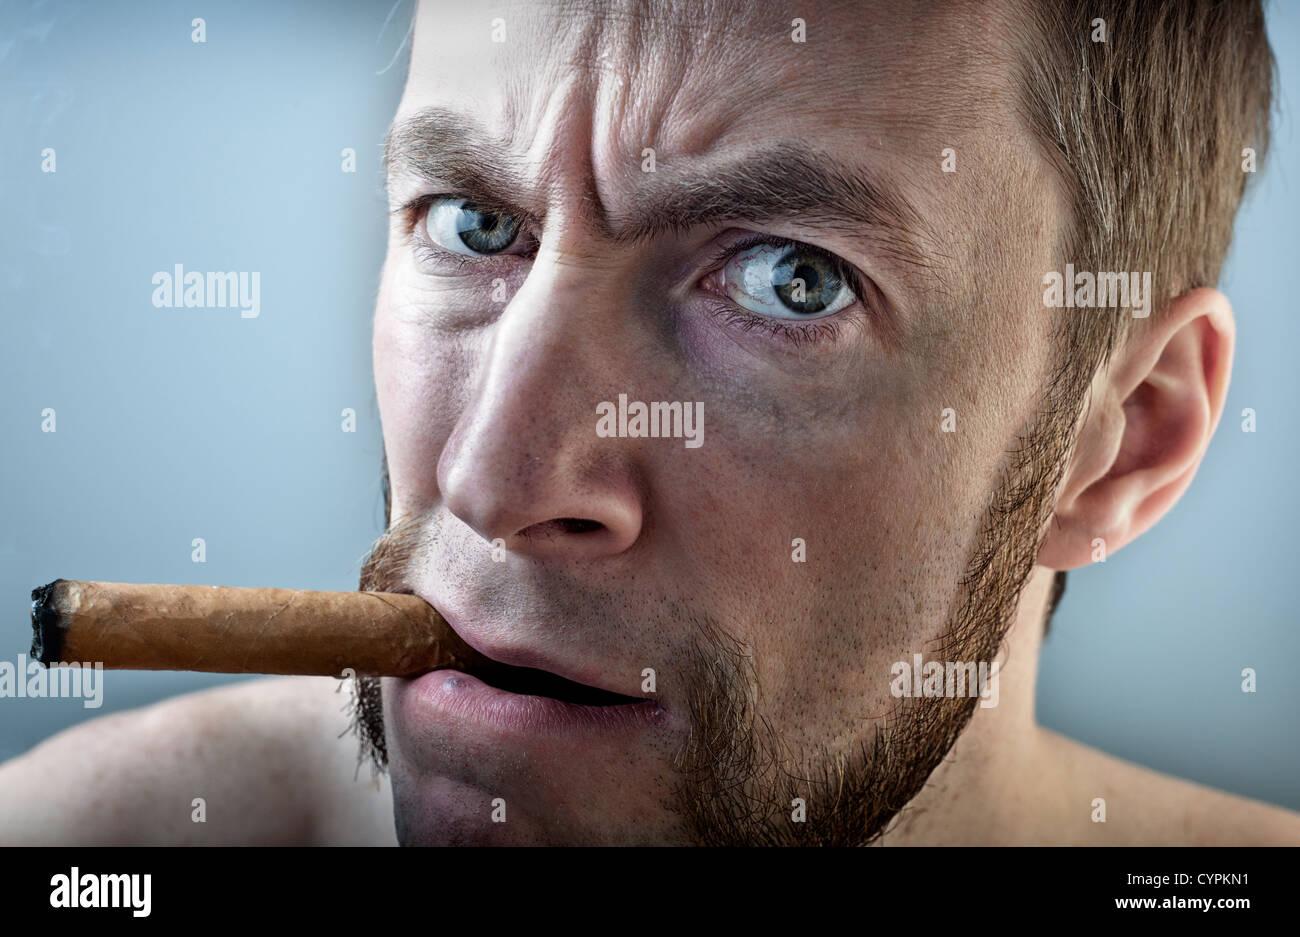 Чувака в рот, Ебут в рот русских девушек на 11 фотография